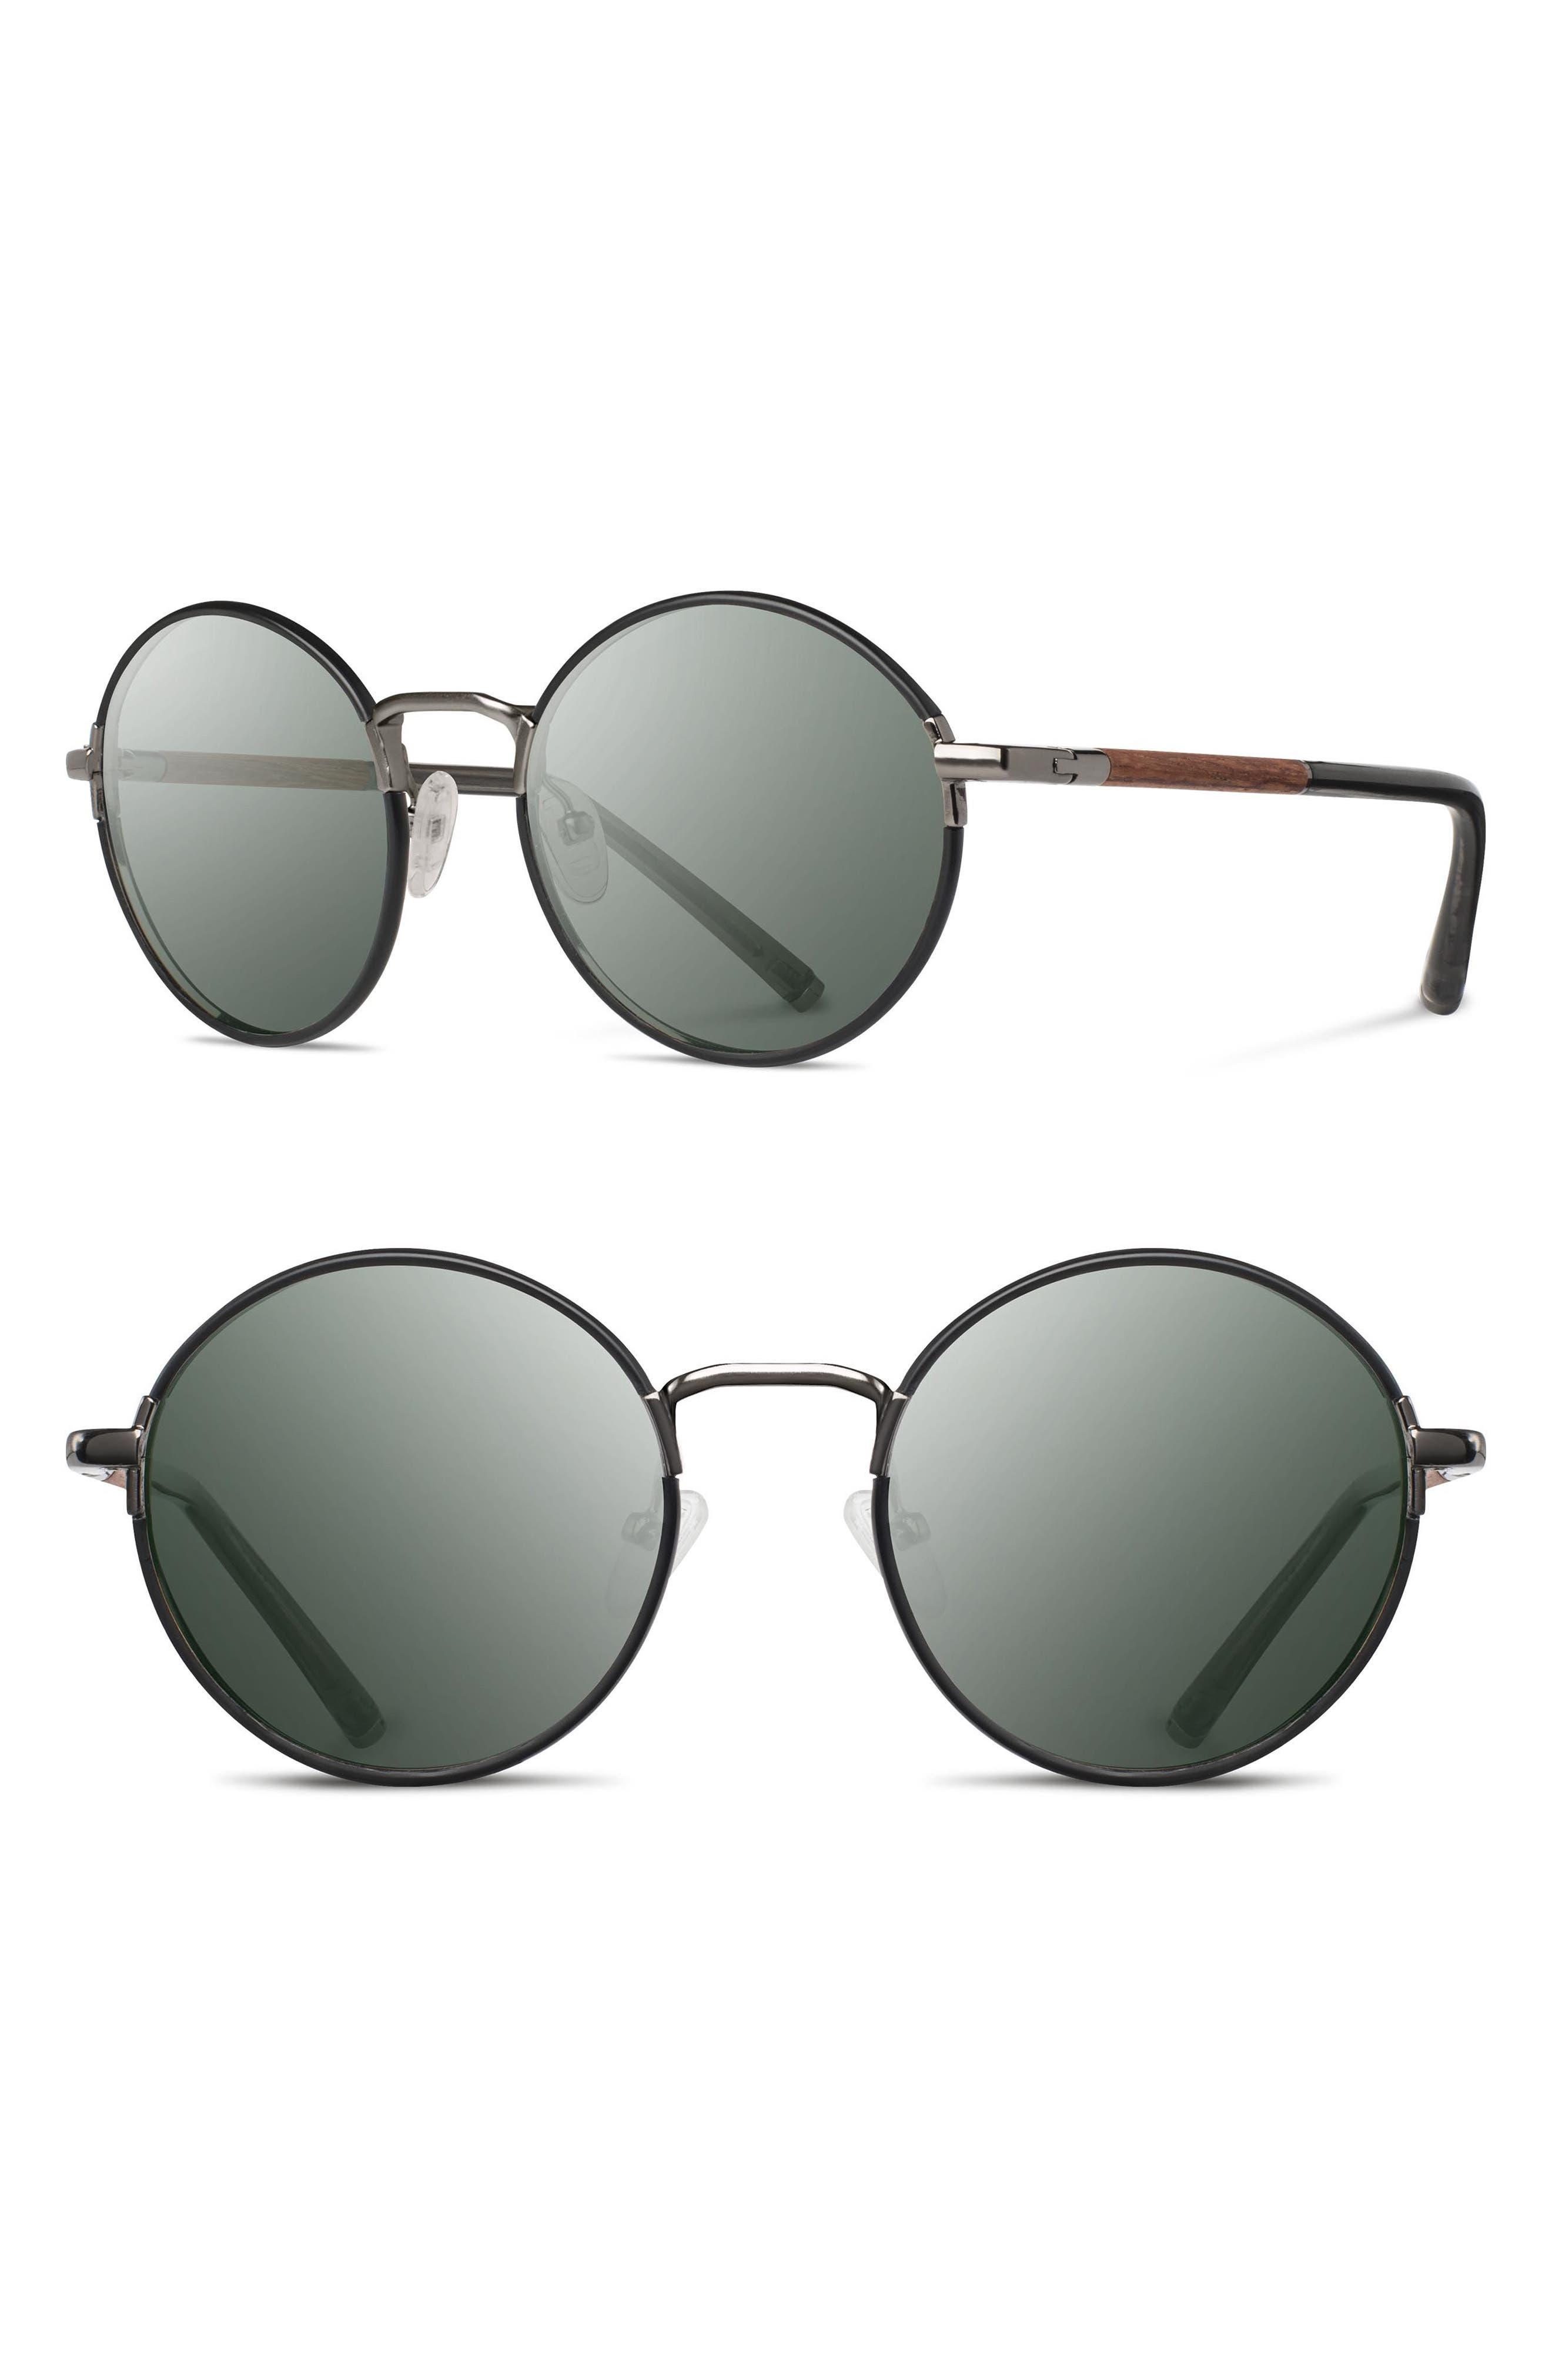 Hawthorne 50mm Acetate Sunglasses,                             Main thumbnail 1, color,